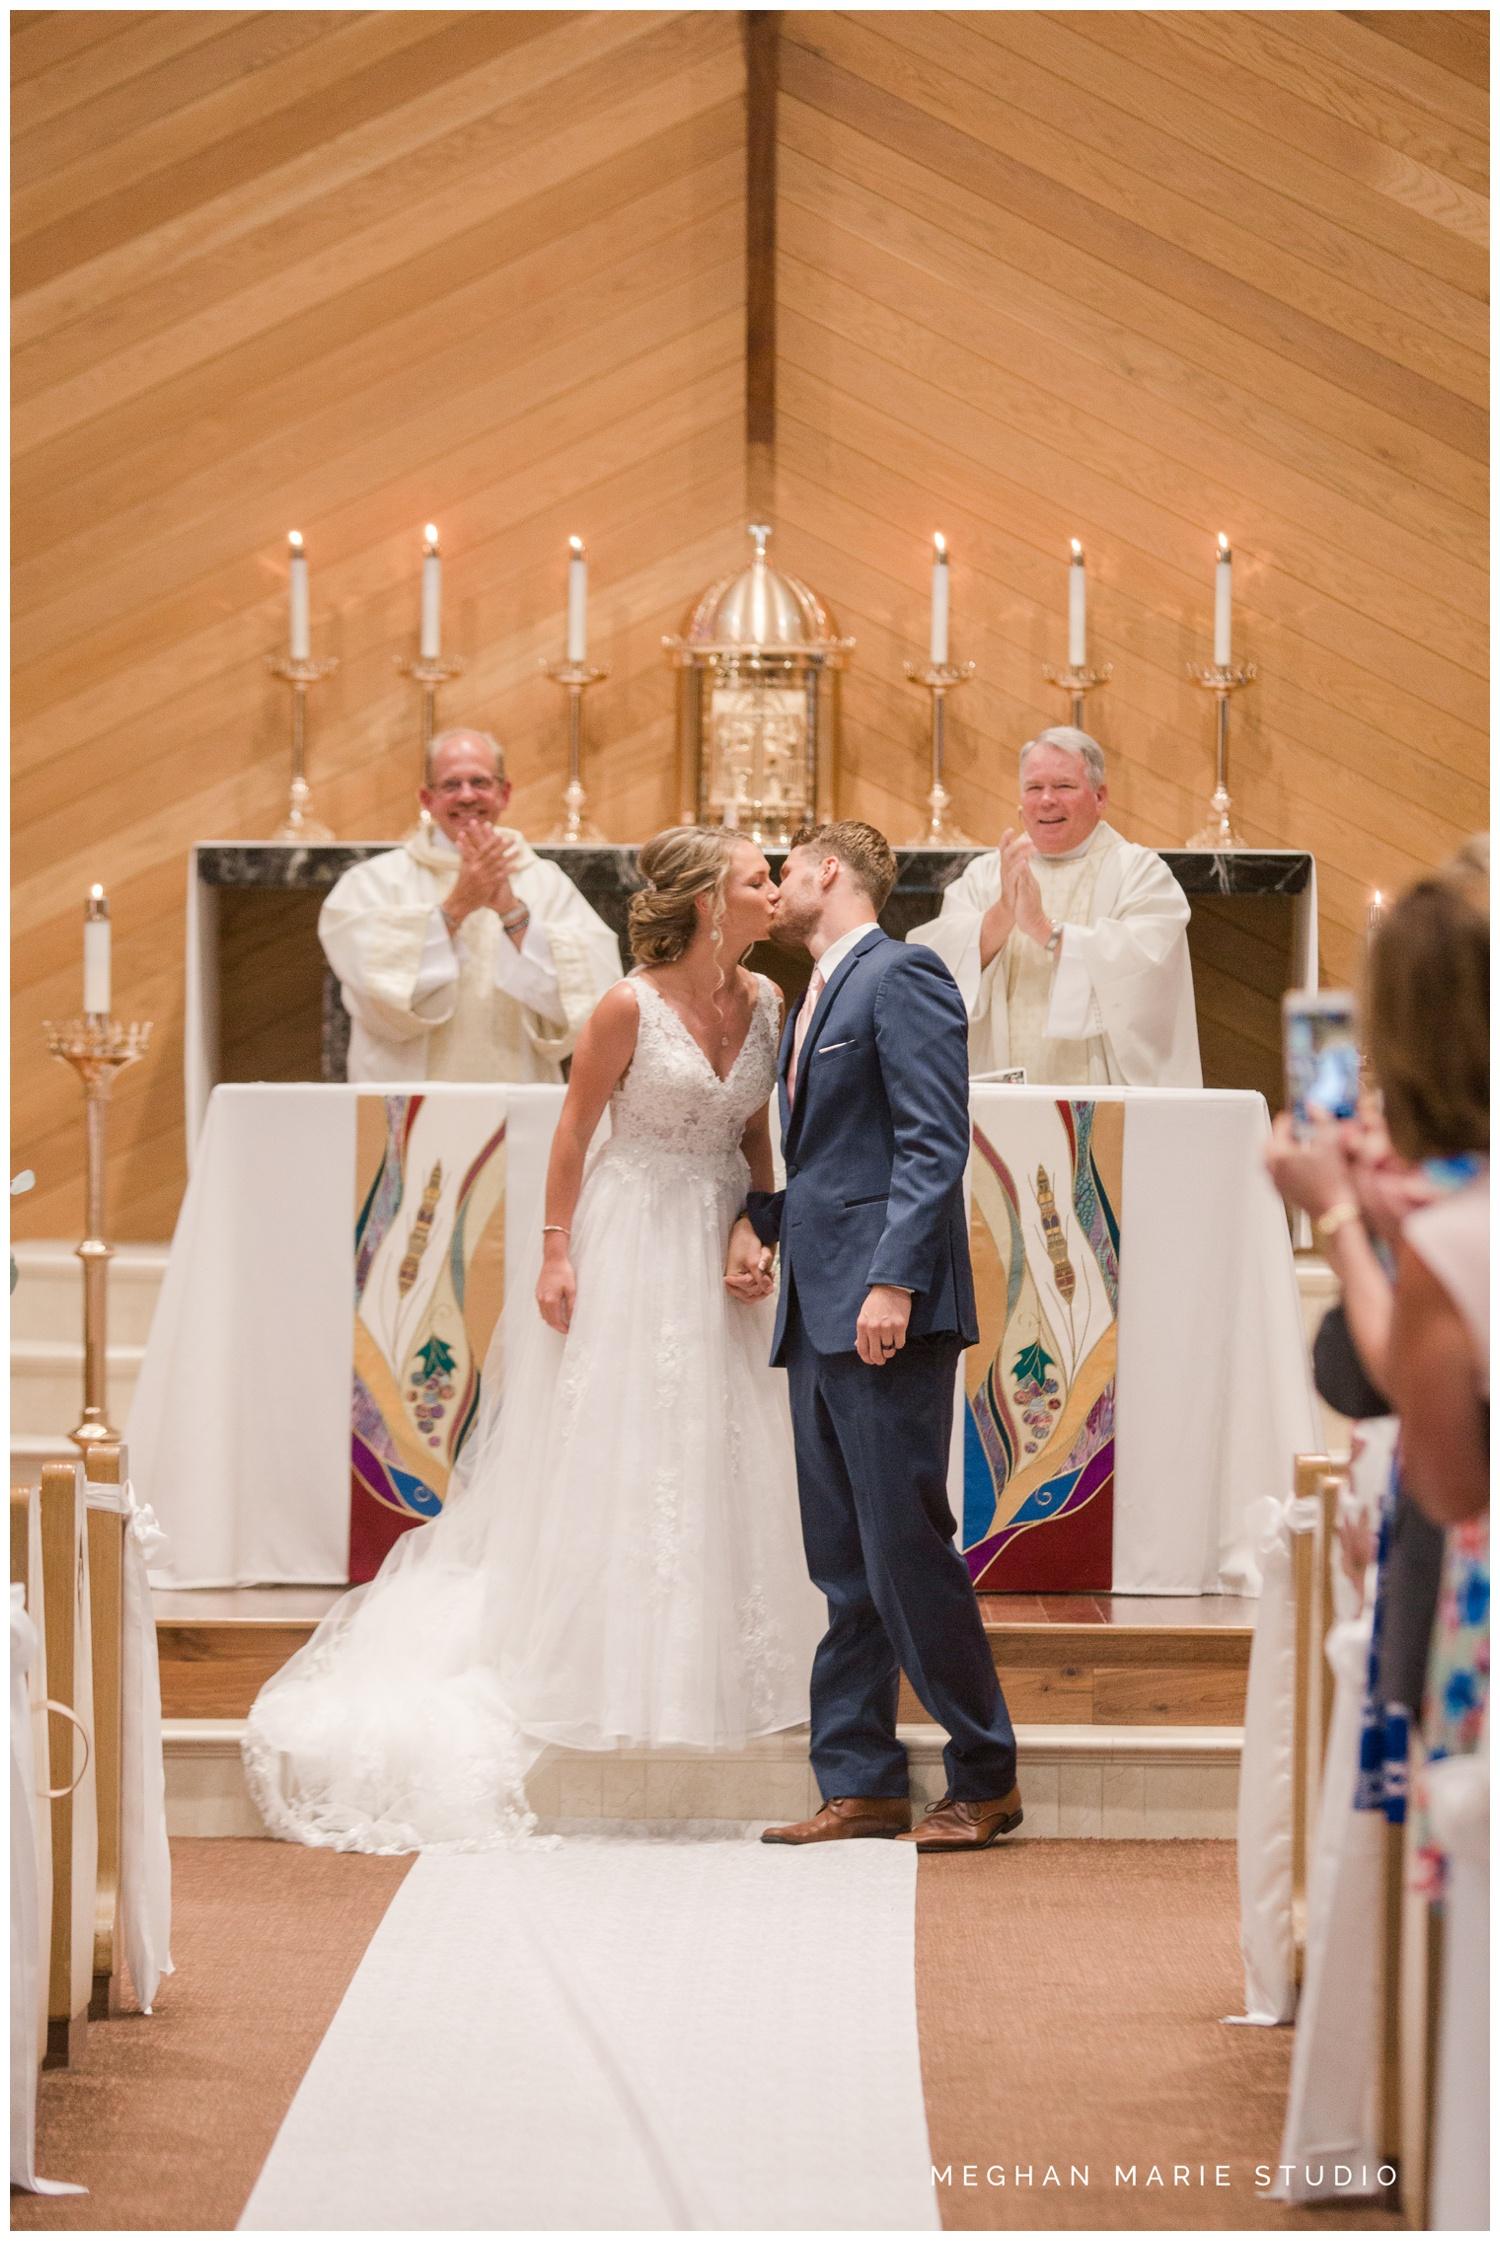 meghan marie studio ohio wedding kyle ahrens msu michigan state basketball spartans navy blush rustic barn soft warm bright bubbles catholic church_0380.jpg